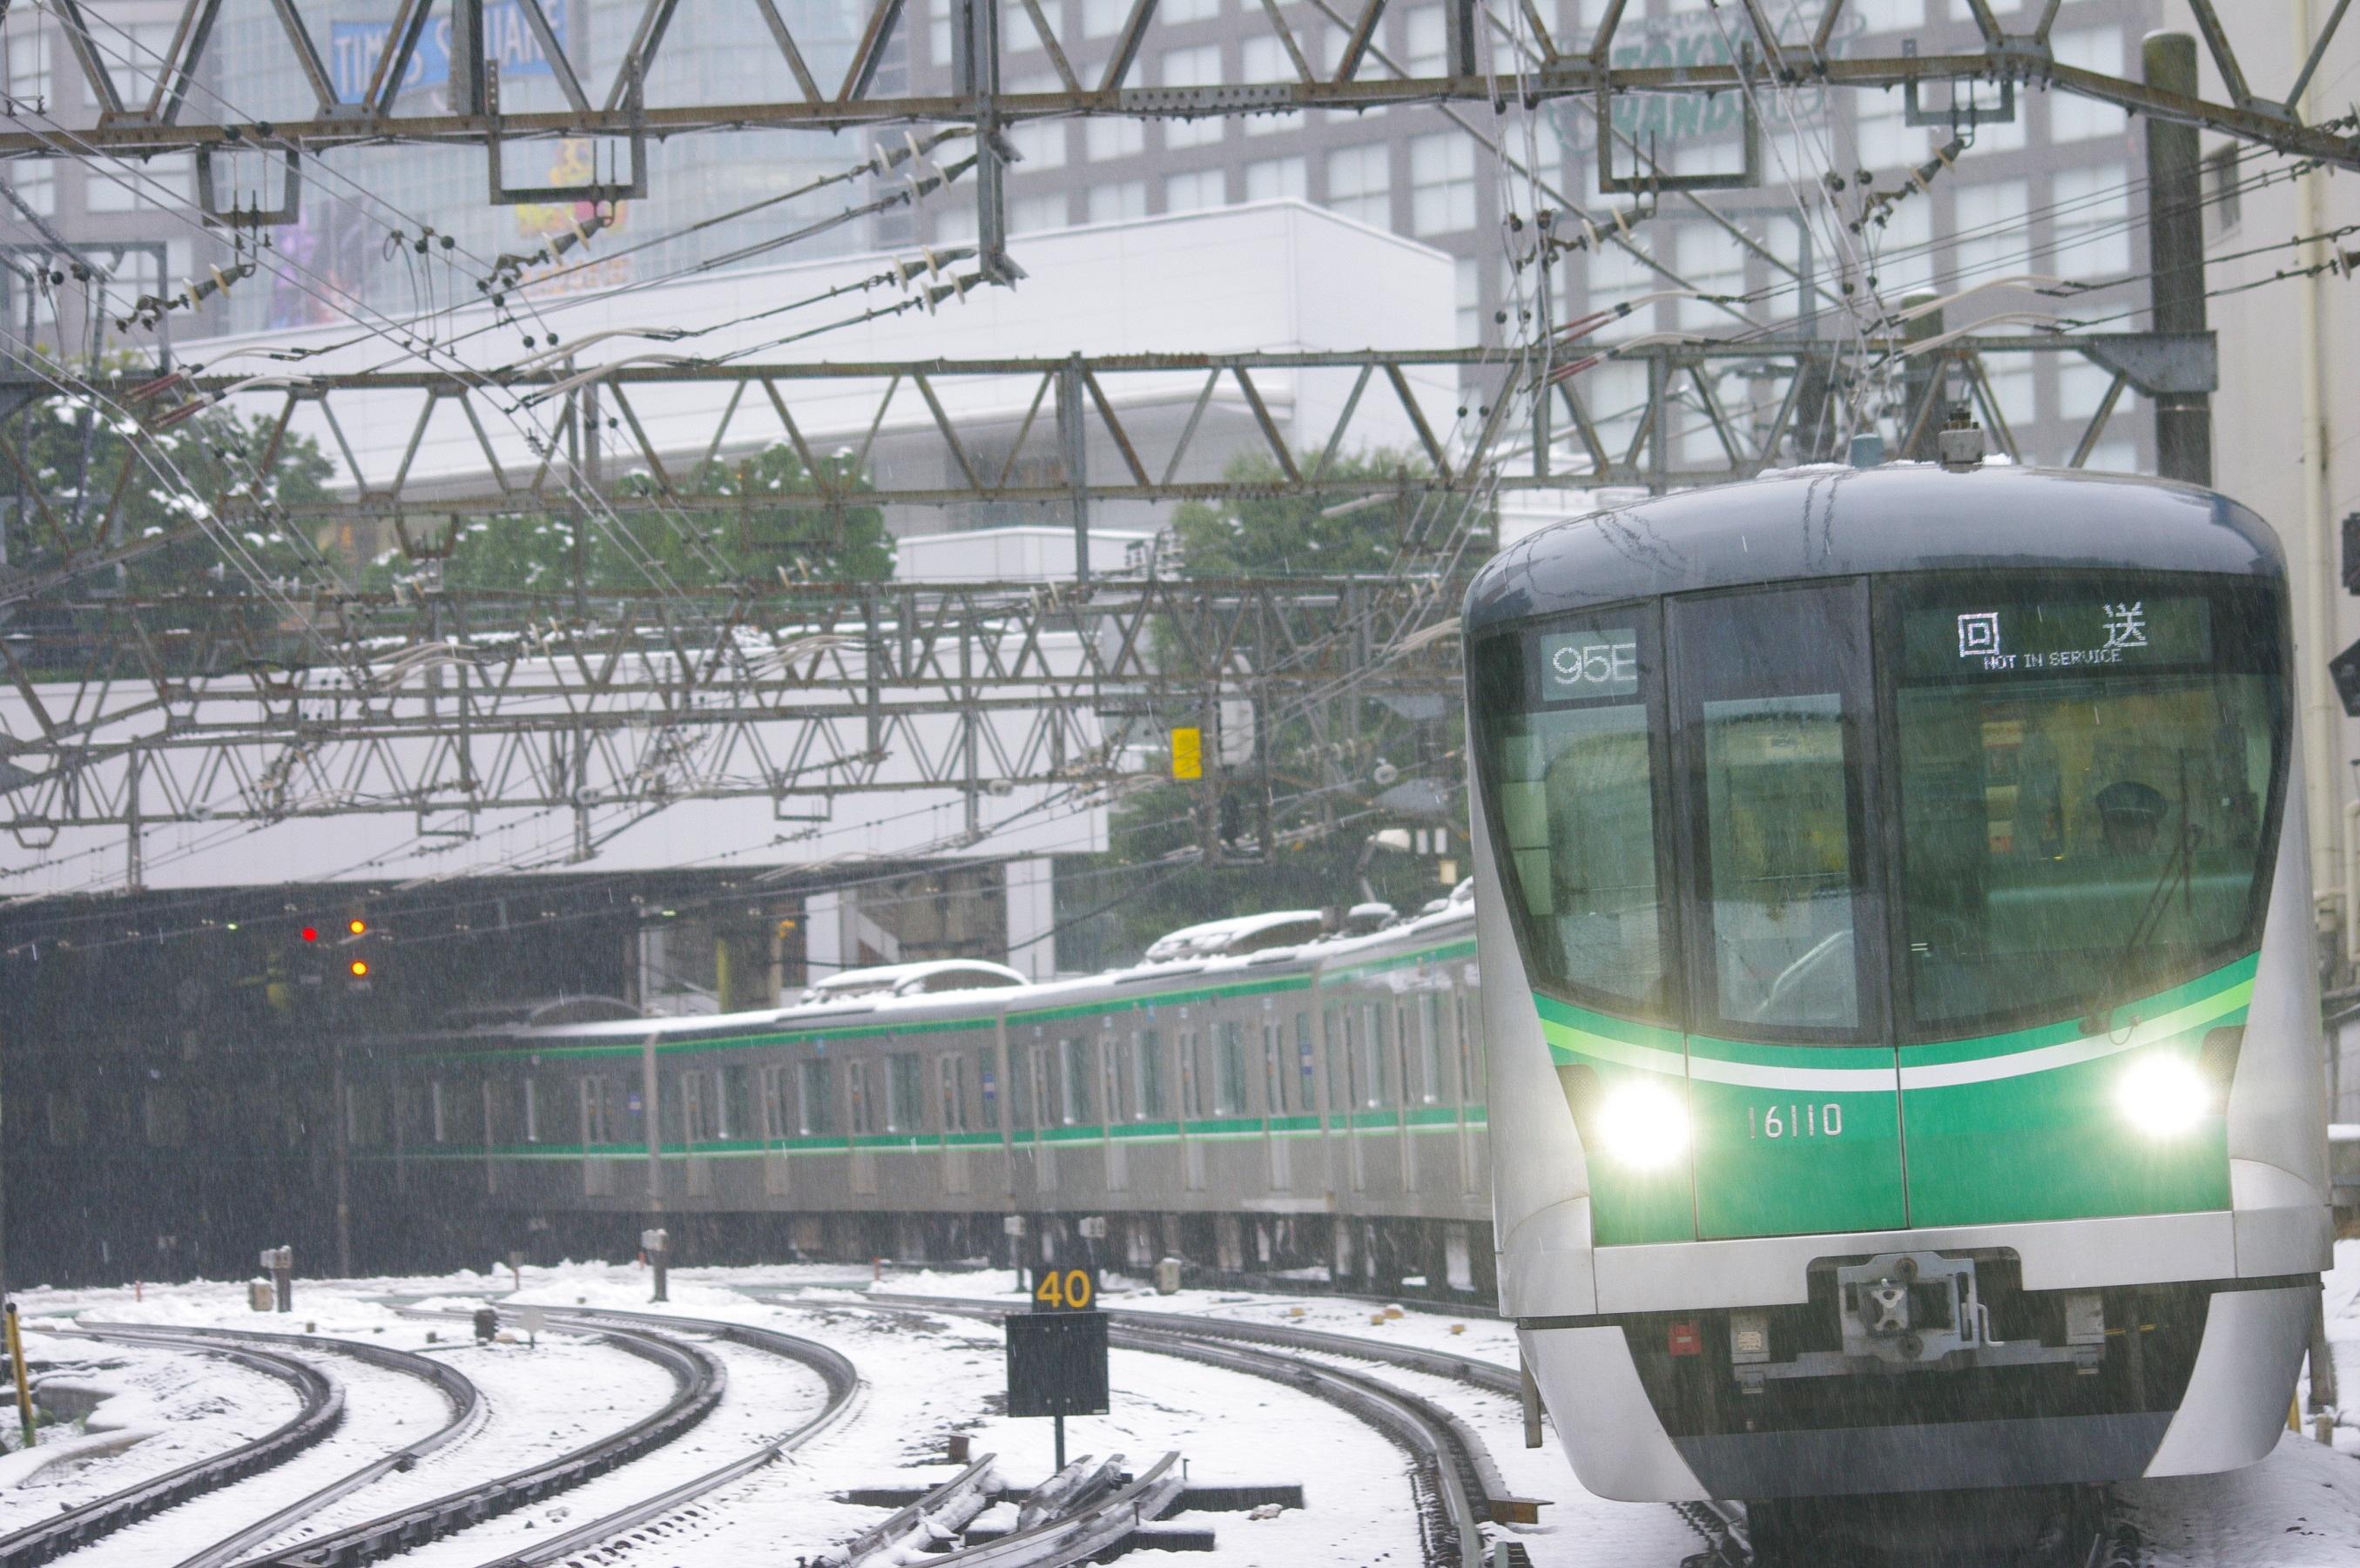 2015/01/18「95E代走折返し回送」